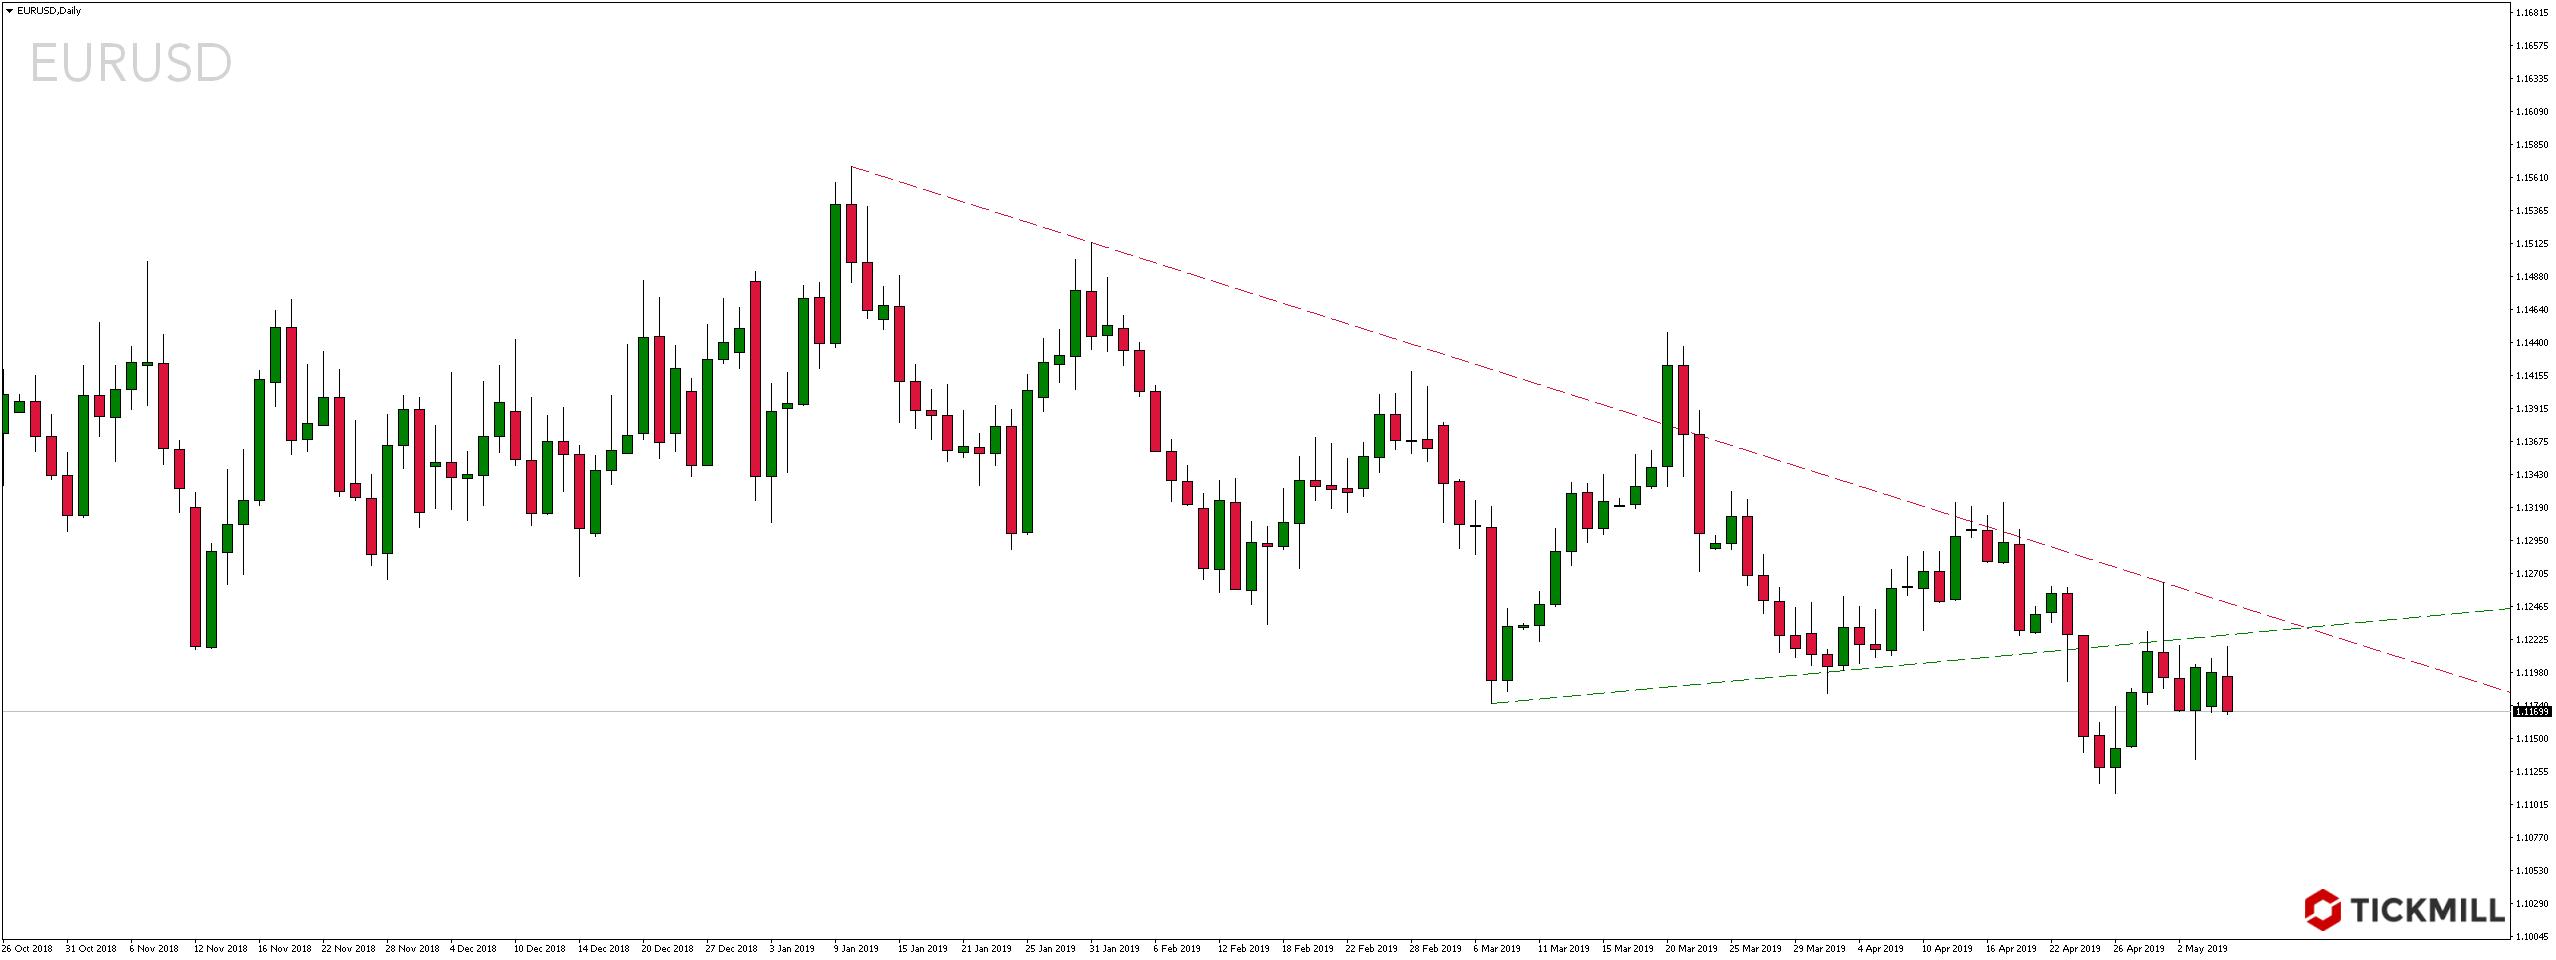 Kurs pary walutowej EURUSD we wtorek, 7 maja 2019 roku